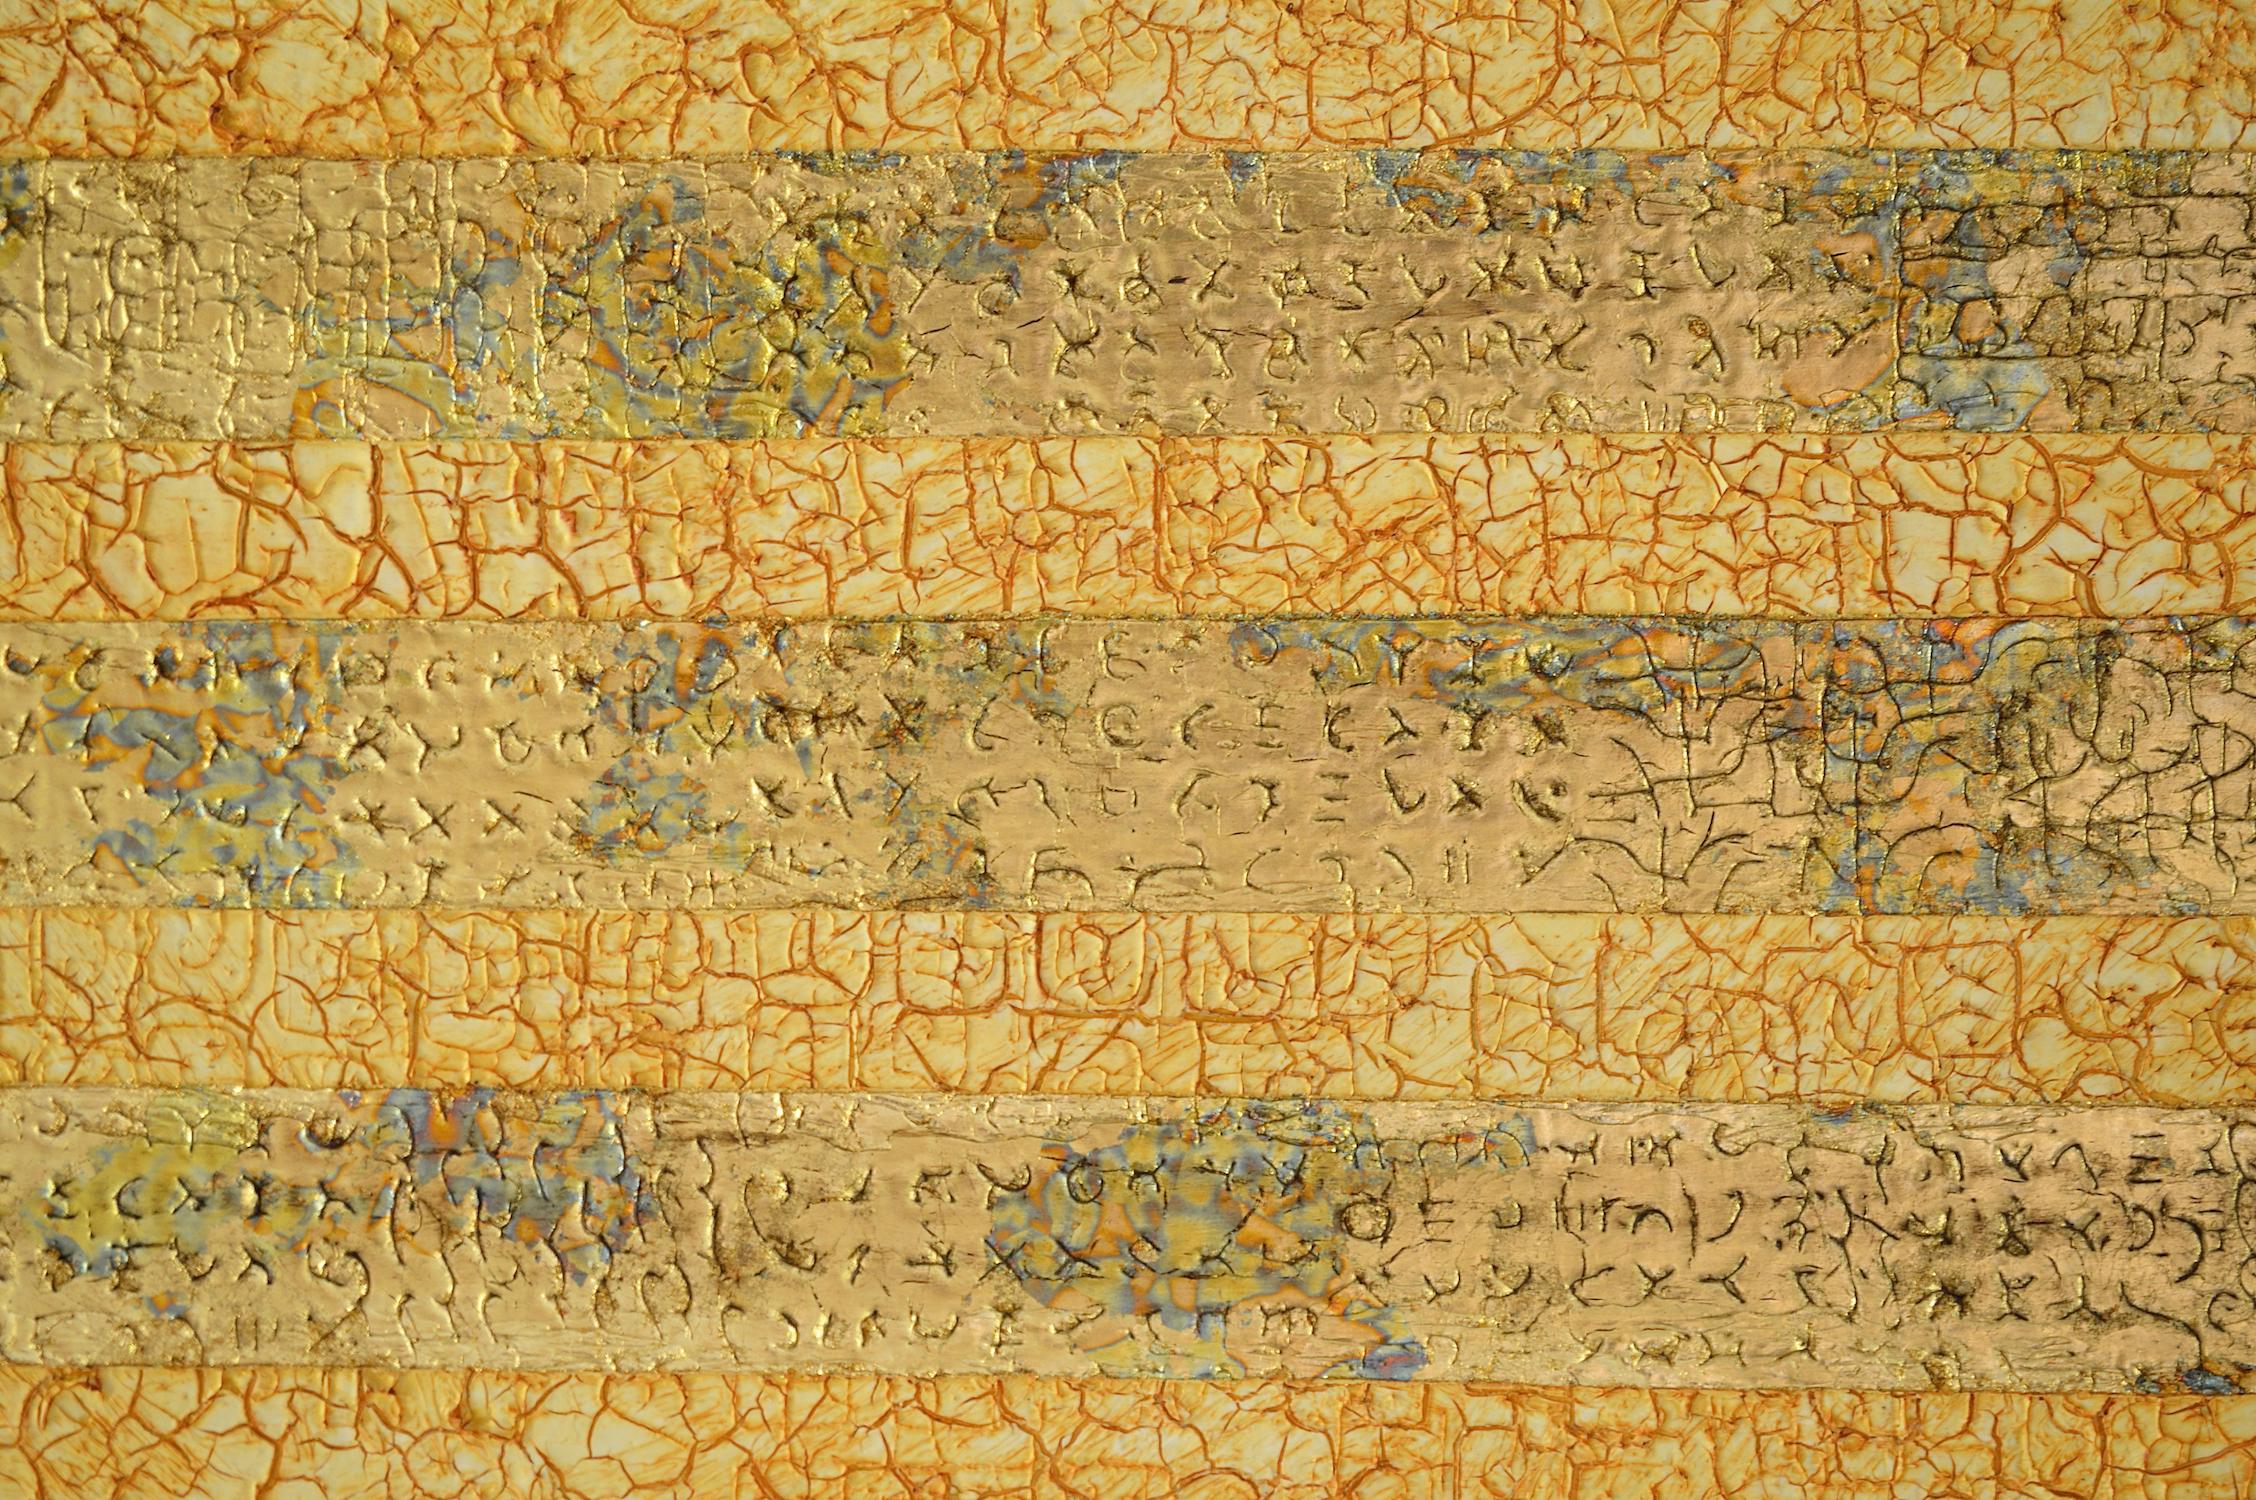 Zaf'farān Prayer Scroll 1 & 2 (Persian - orange yellow wild flower) detail